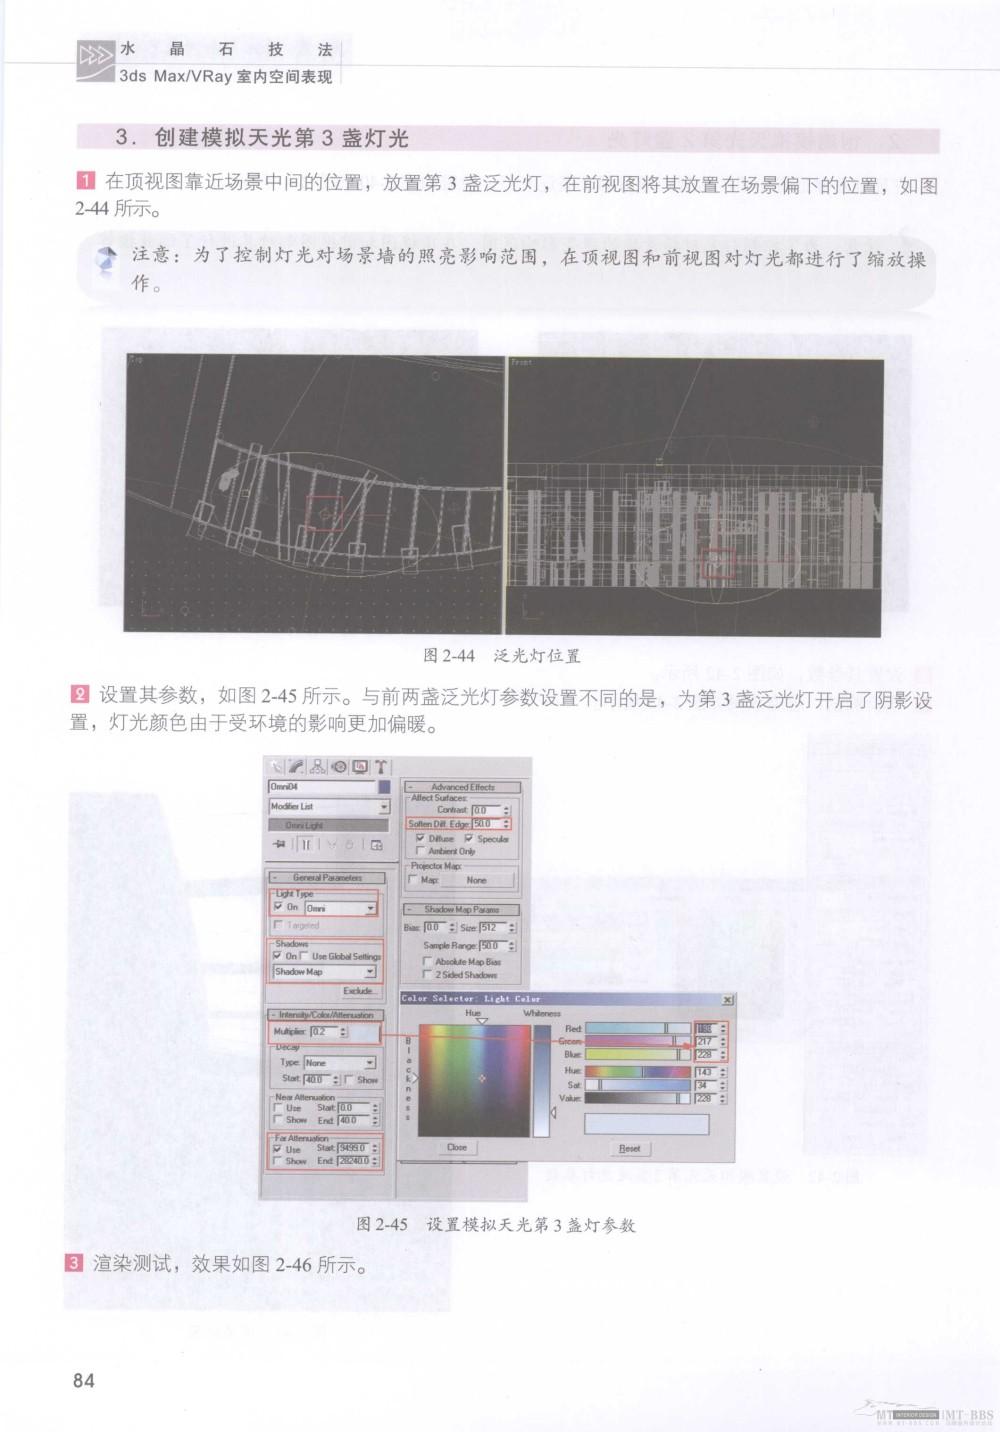 水晶石技法-3ds_Max&VRay室内空间表现_水晶石技法-3ds_Max&VRay室内空间表现_页面_090.jpg